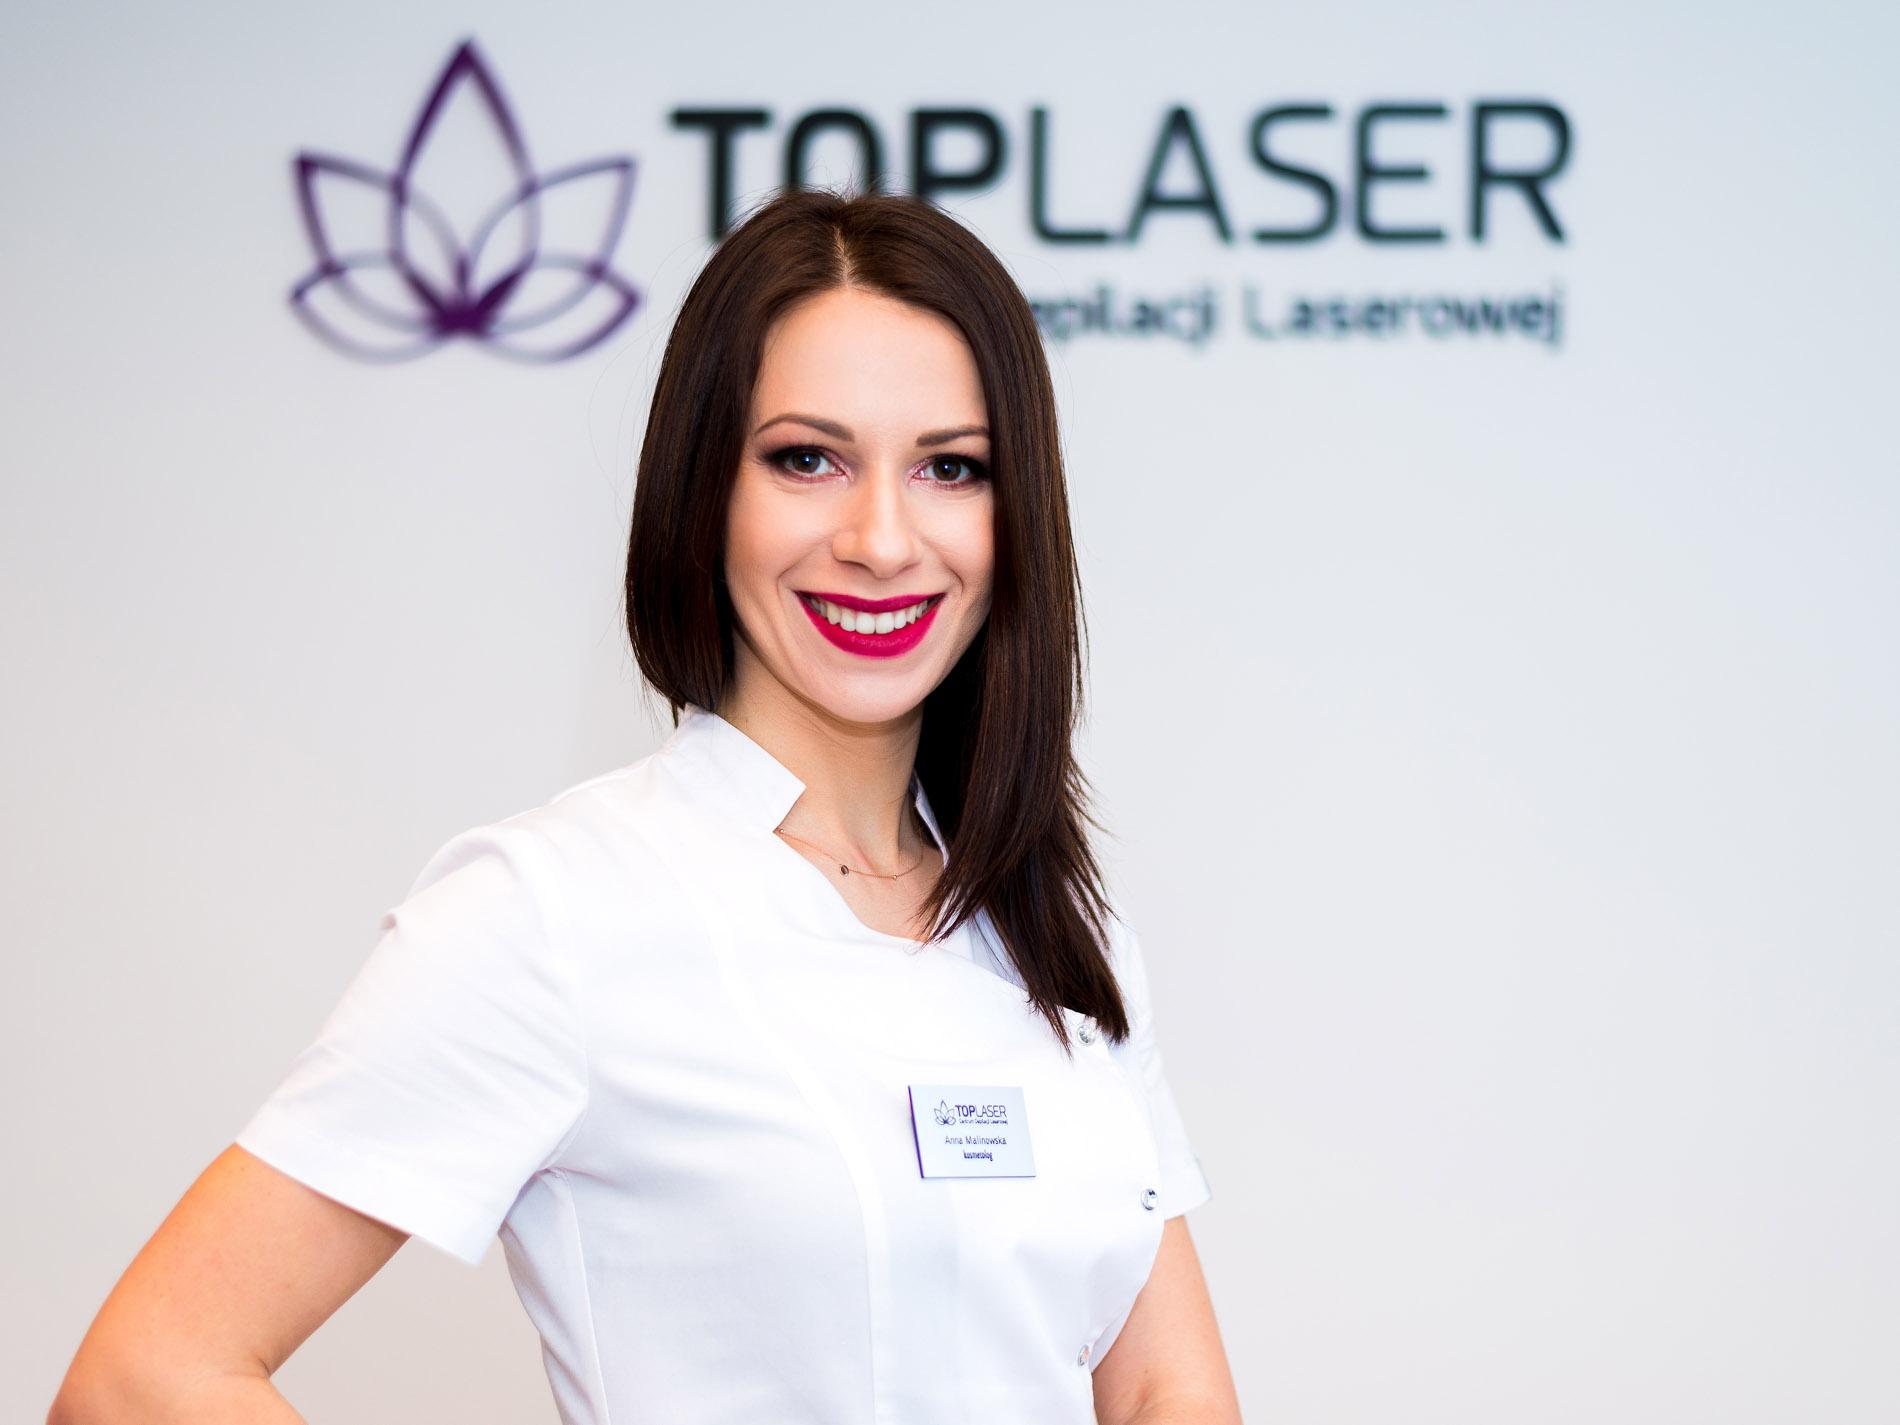 top_laser-7321